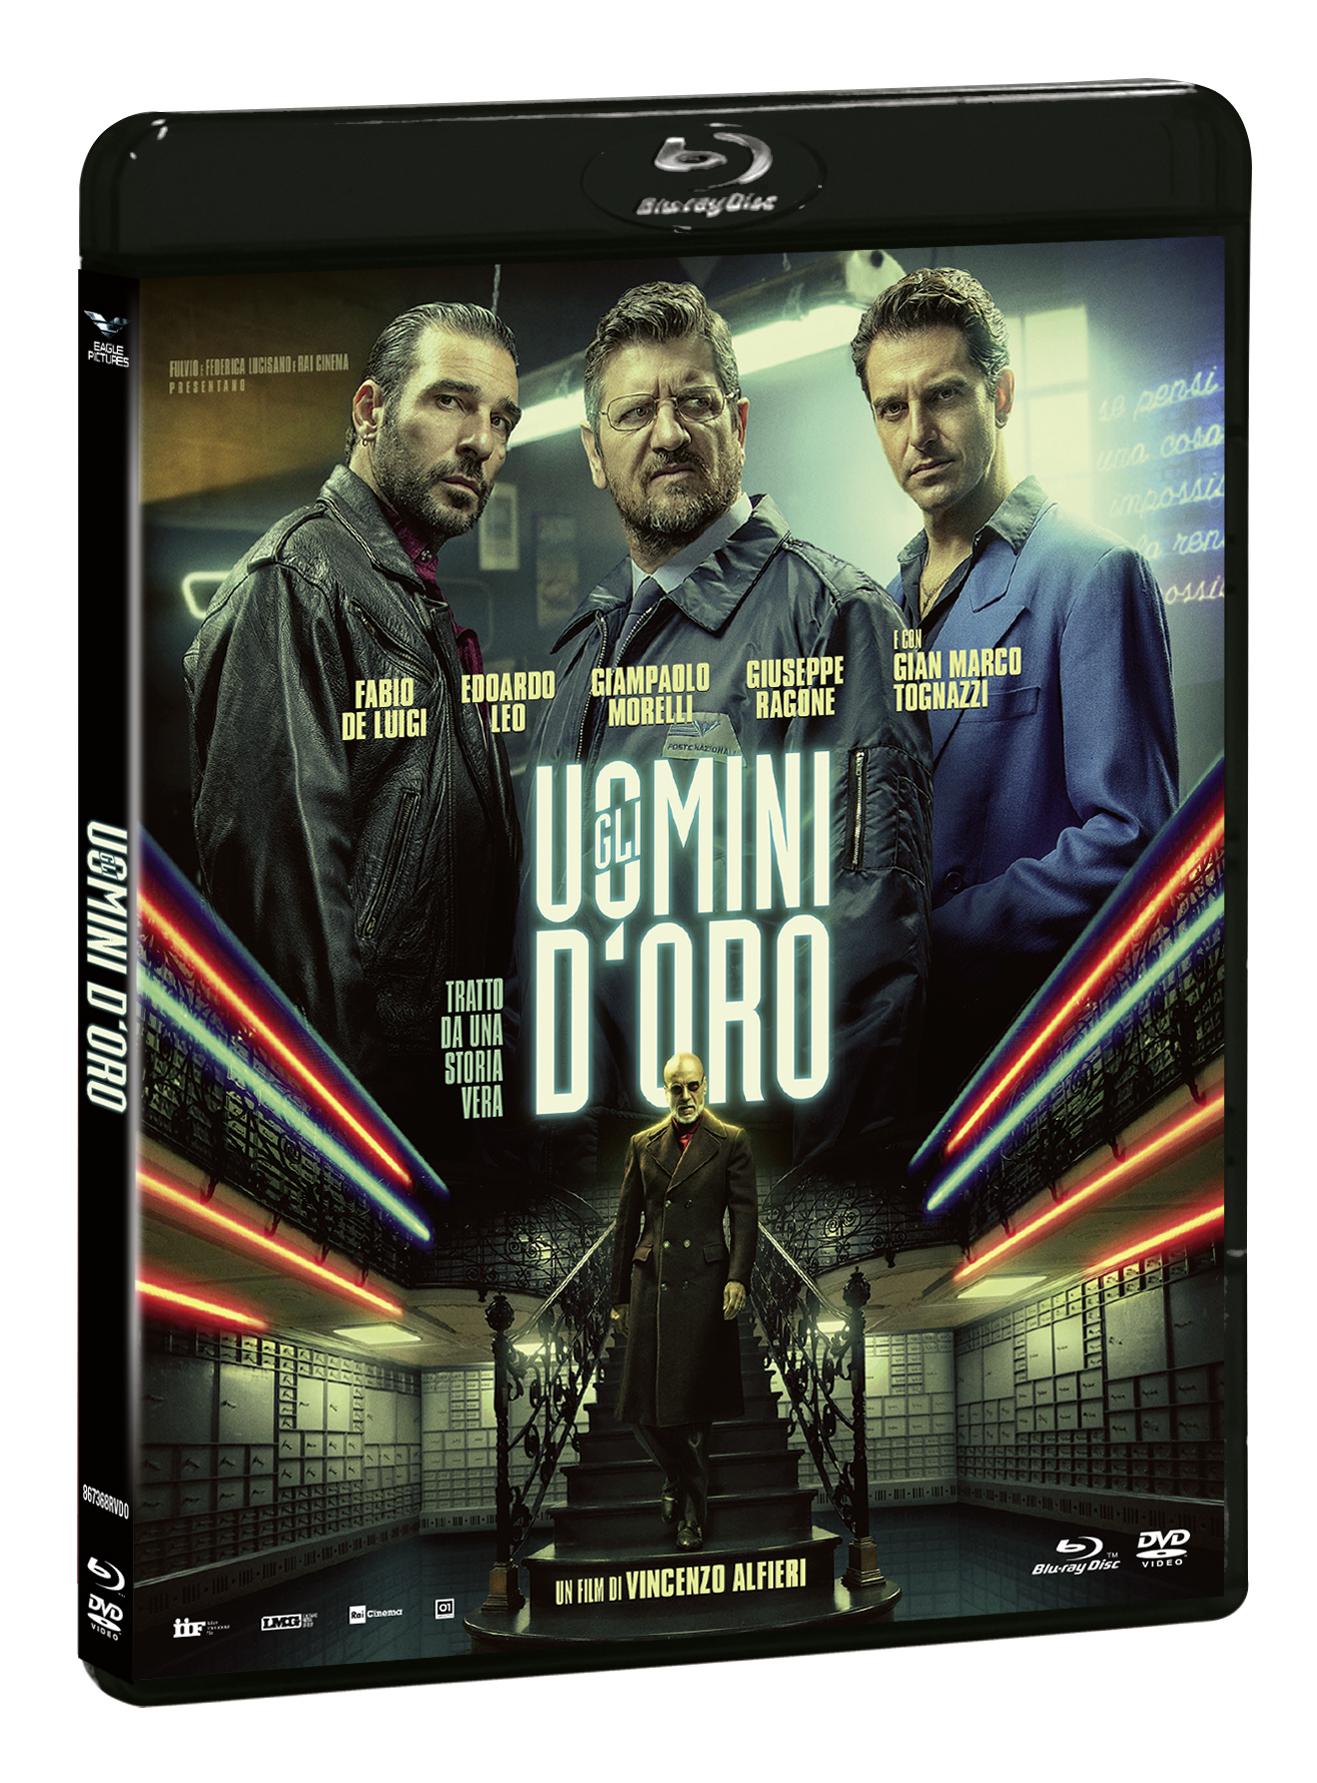 GLI UOMINI D'ORO (BLU-RAY+DVD)